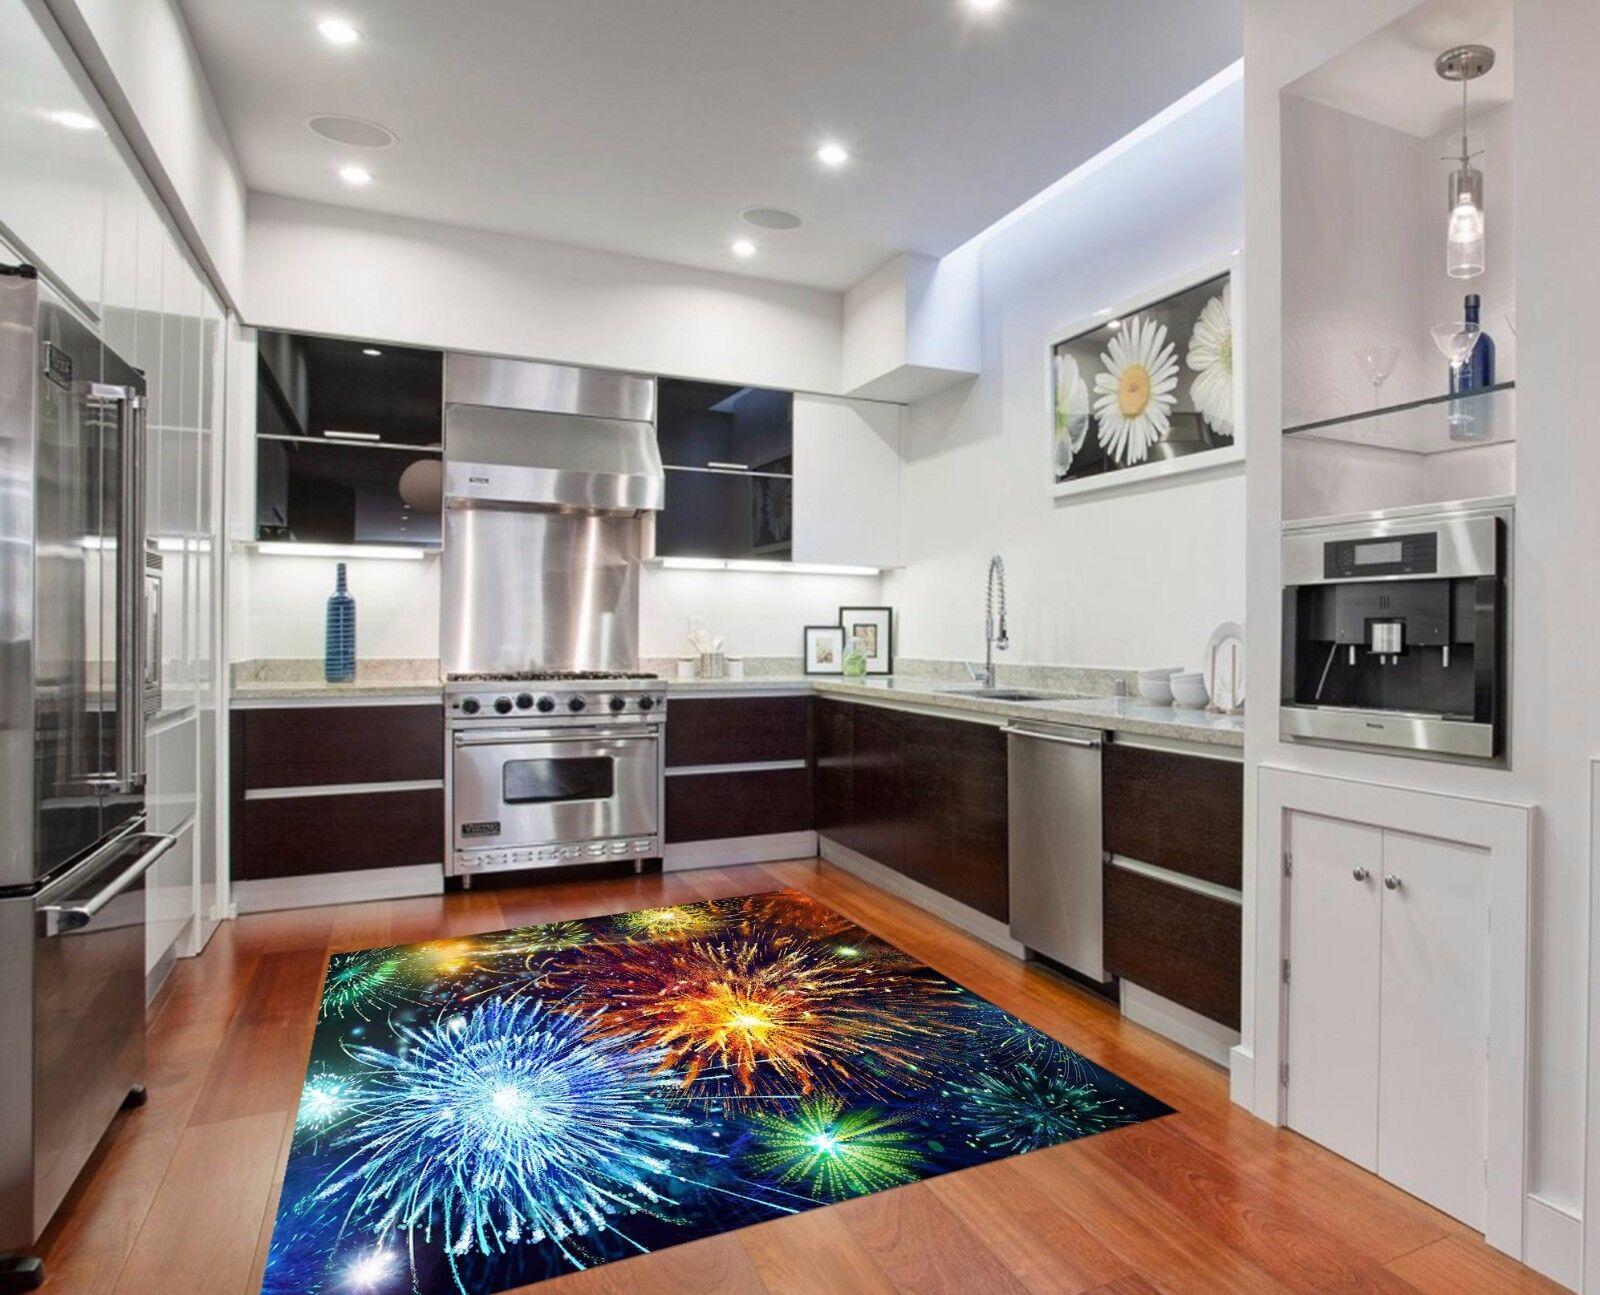 3D Sky Fireworks Kitchen Mat Floor Murals Wall Print Wall Deco AJ WALLPAPER AU